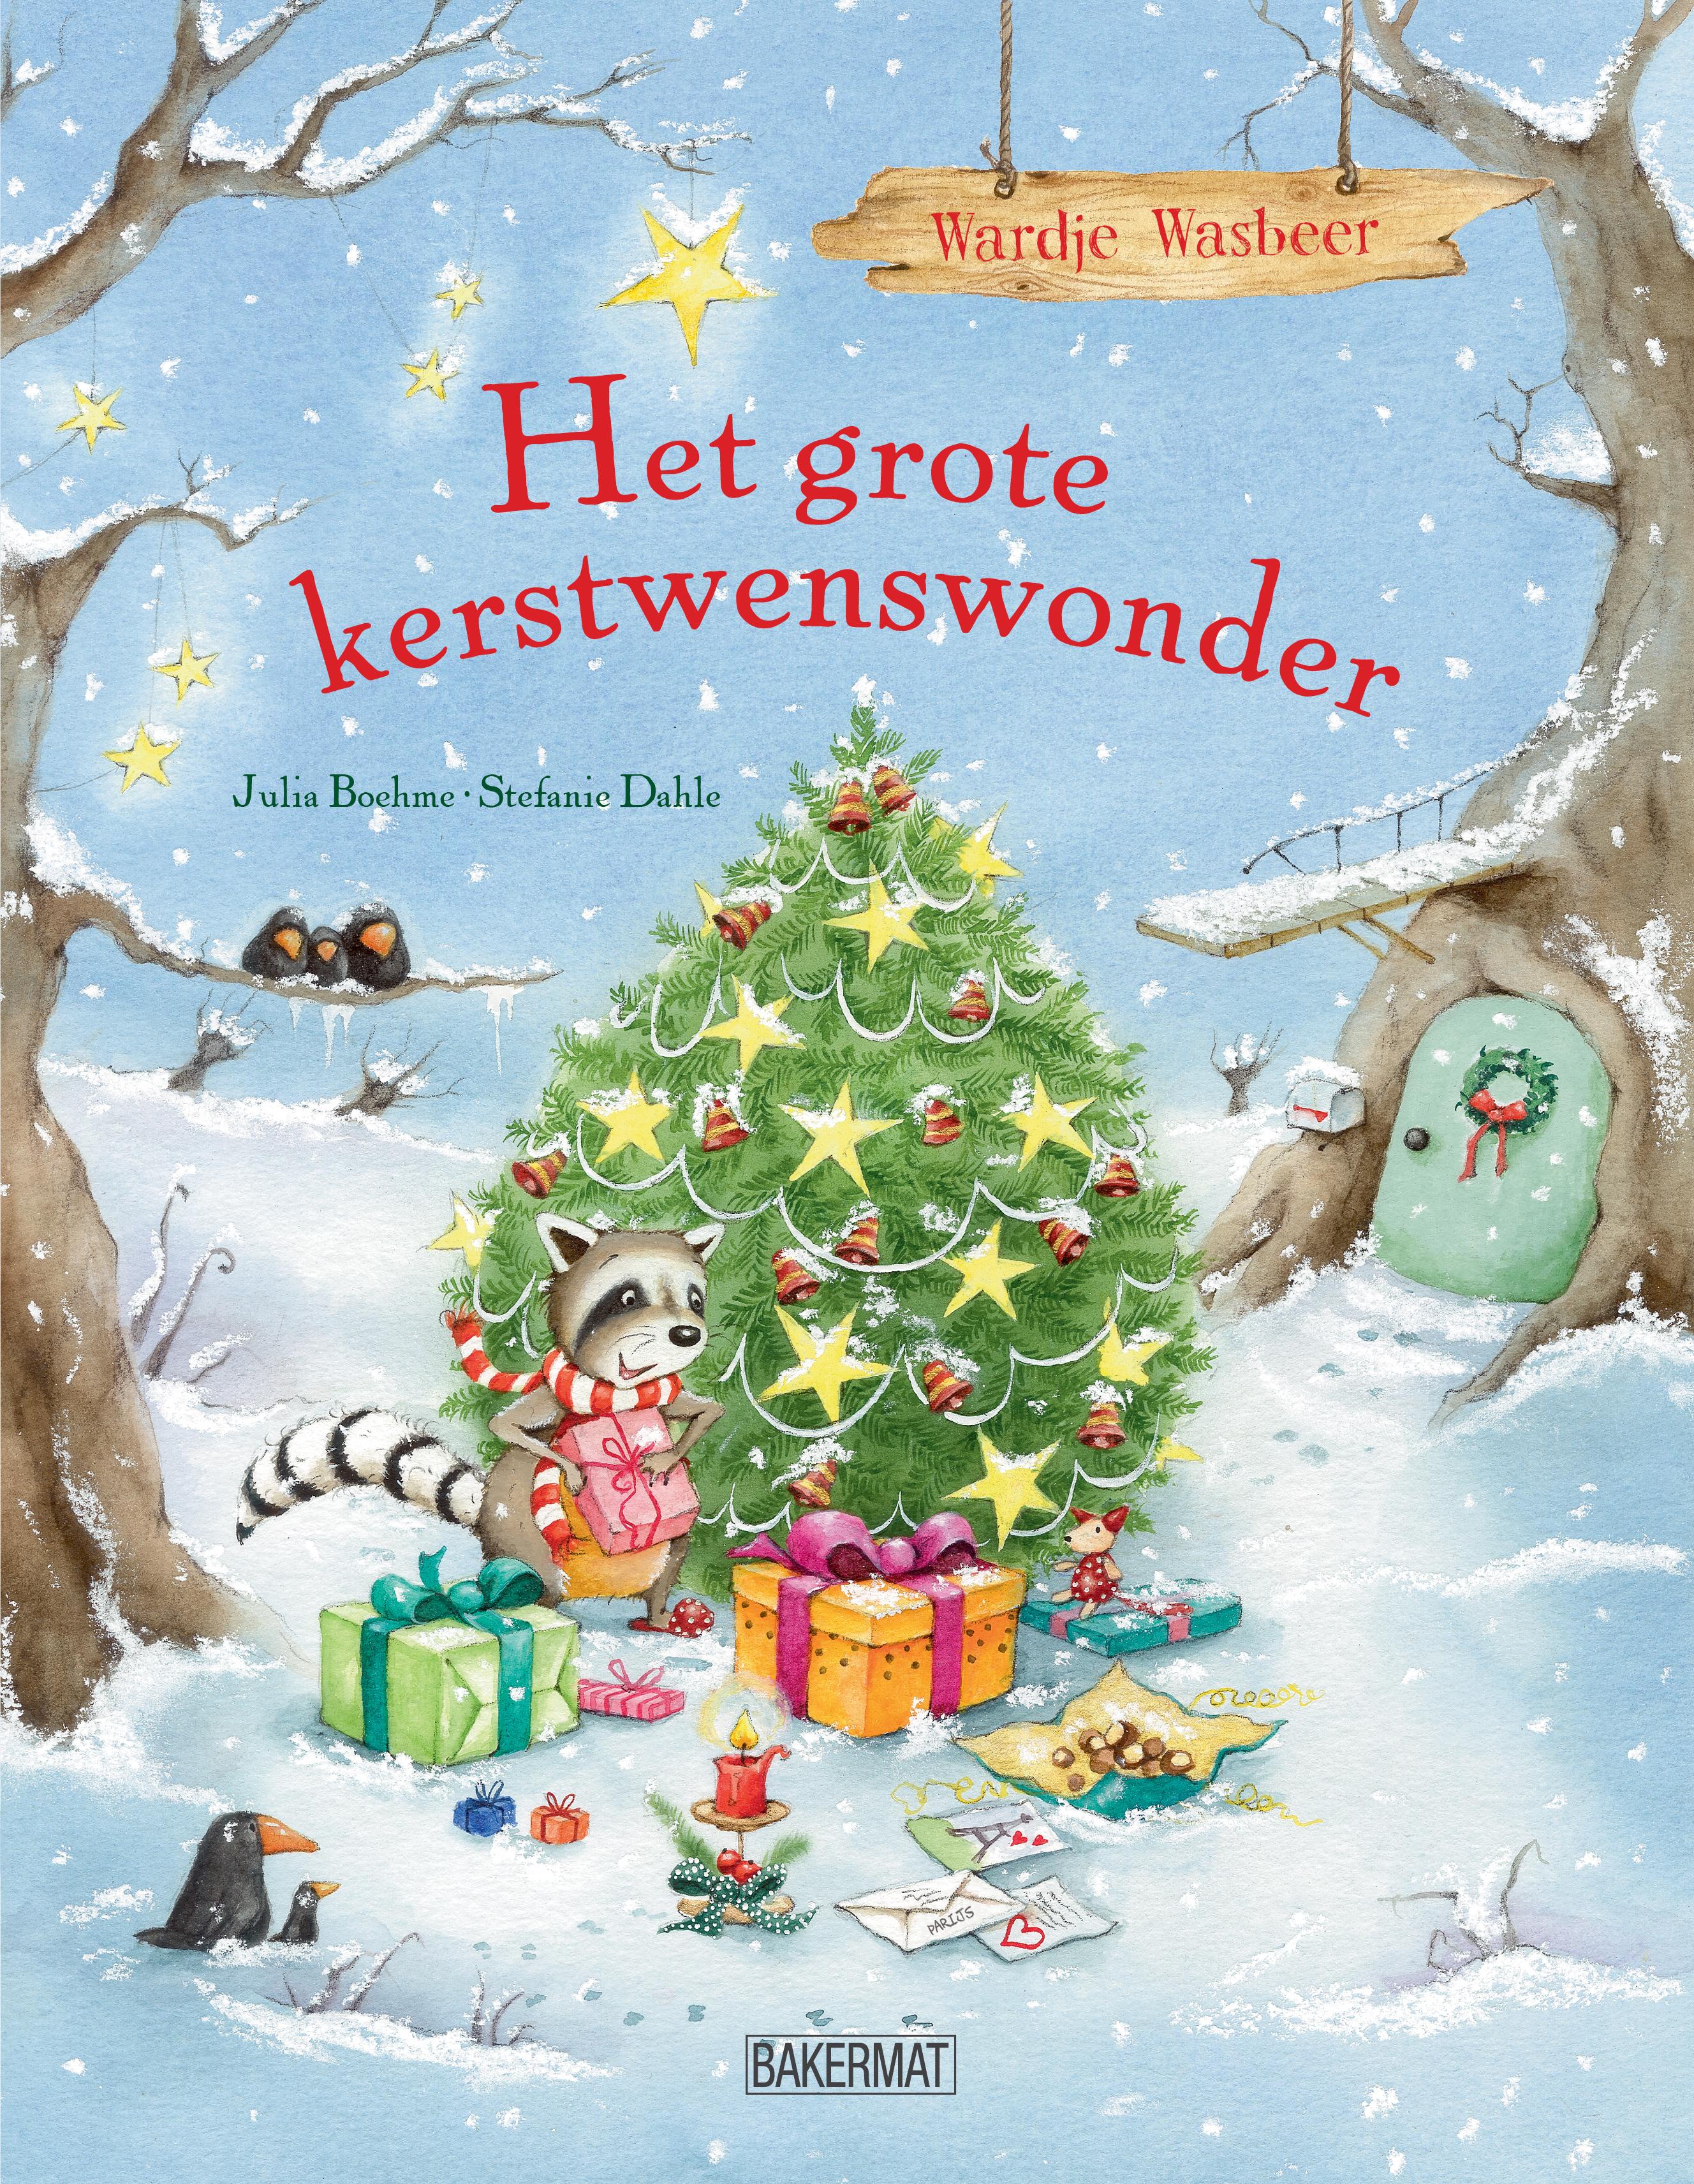 Wardje Wasbeer - Grote Kerstwenswonder cover